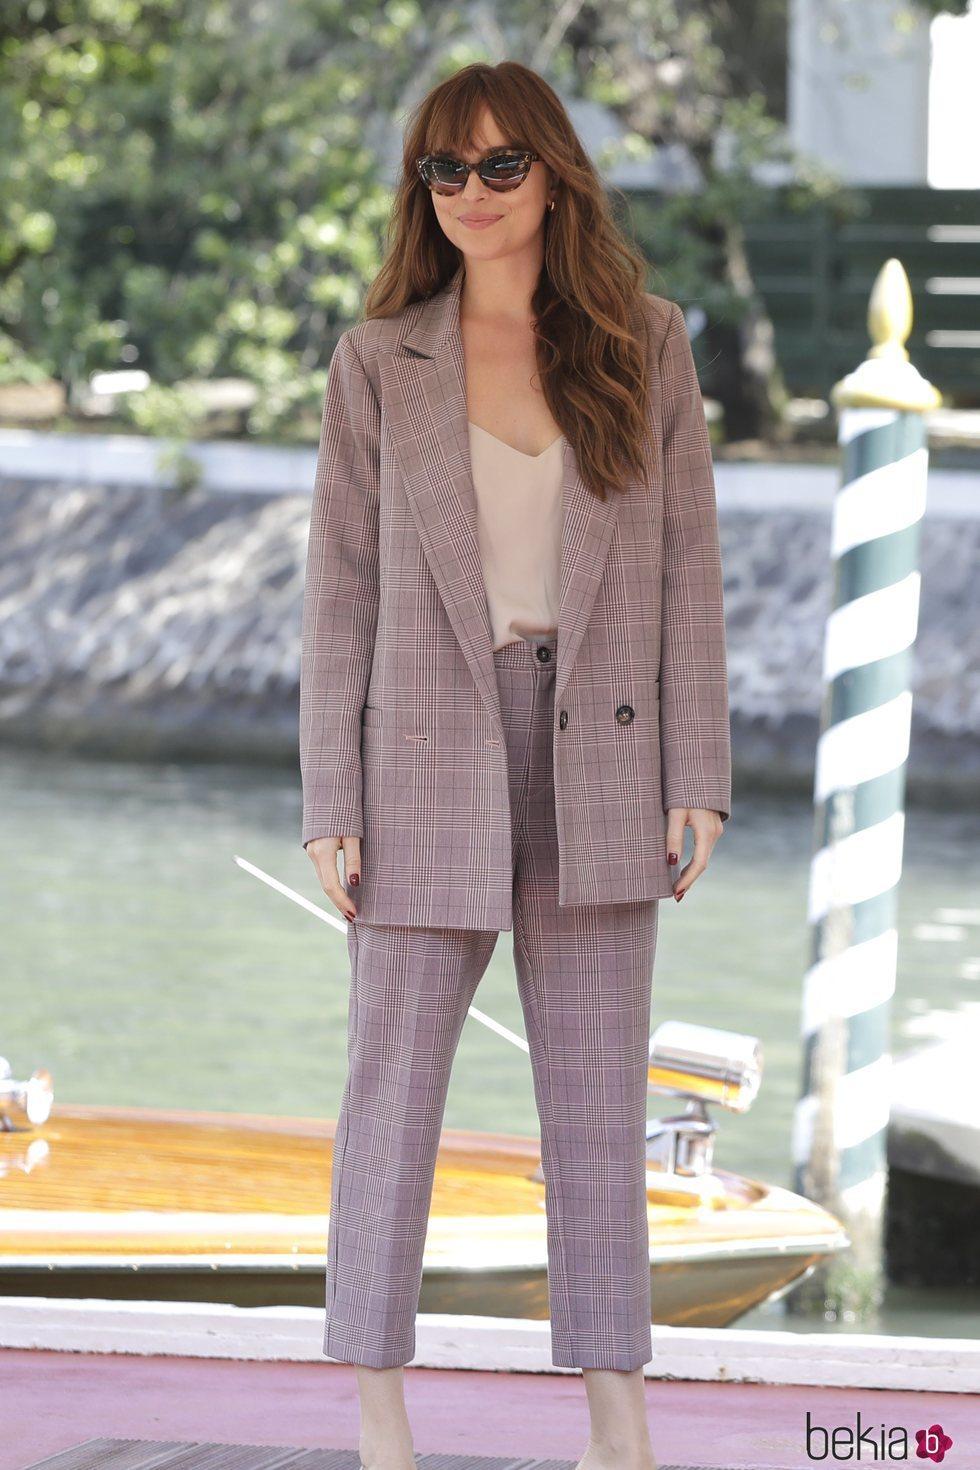 Dakota Johnson con un traje oversized en el Festival de Venecia 2018